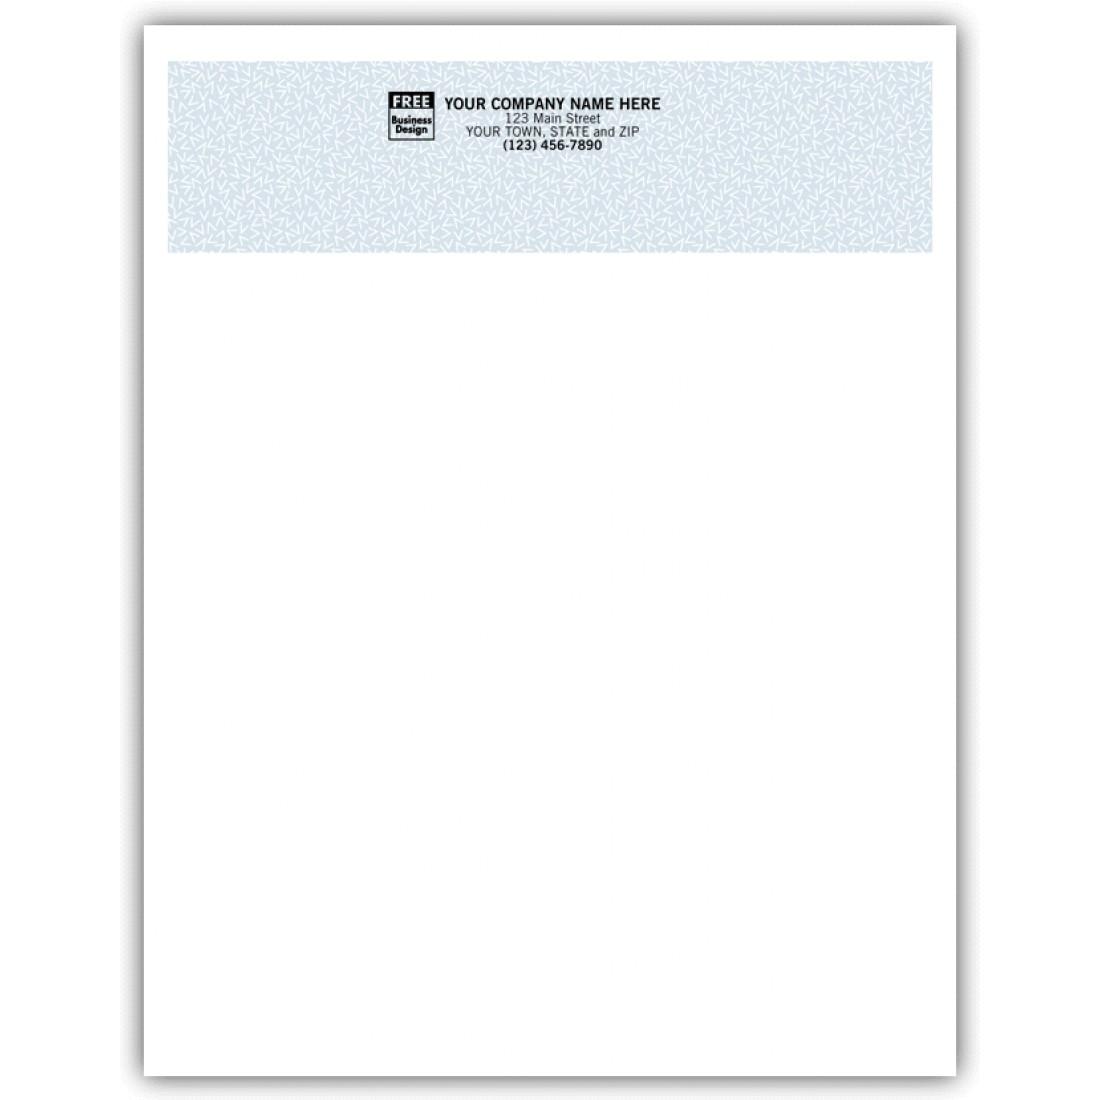 Classic Laser/Inkjet Professional Invoice